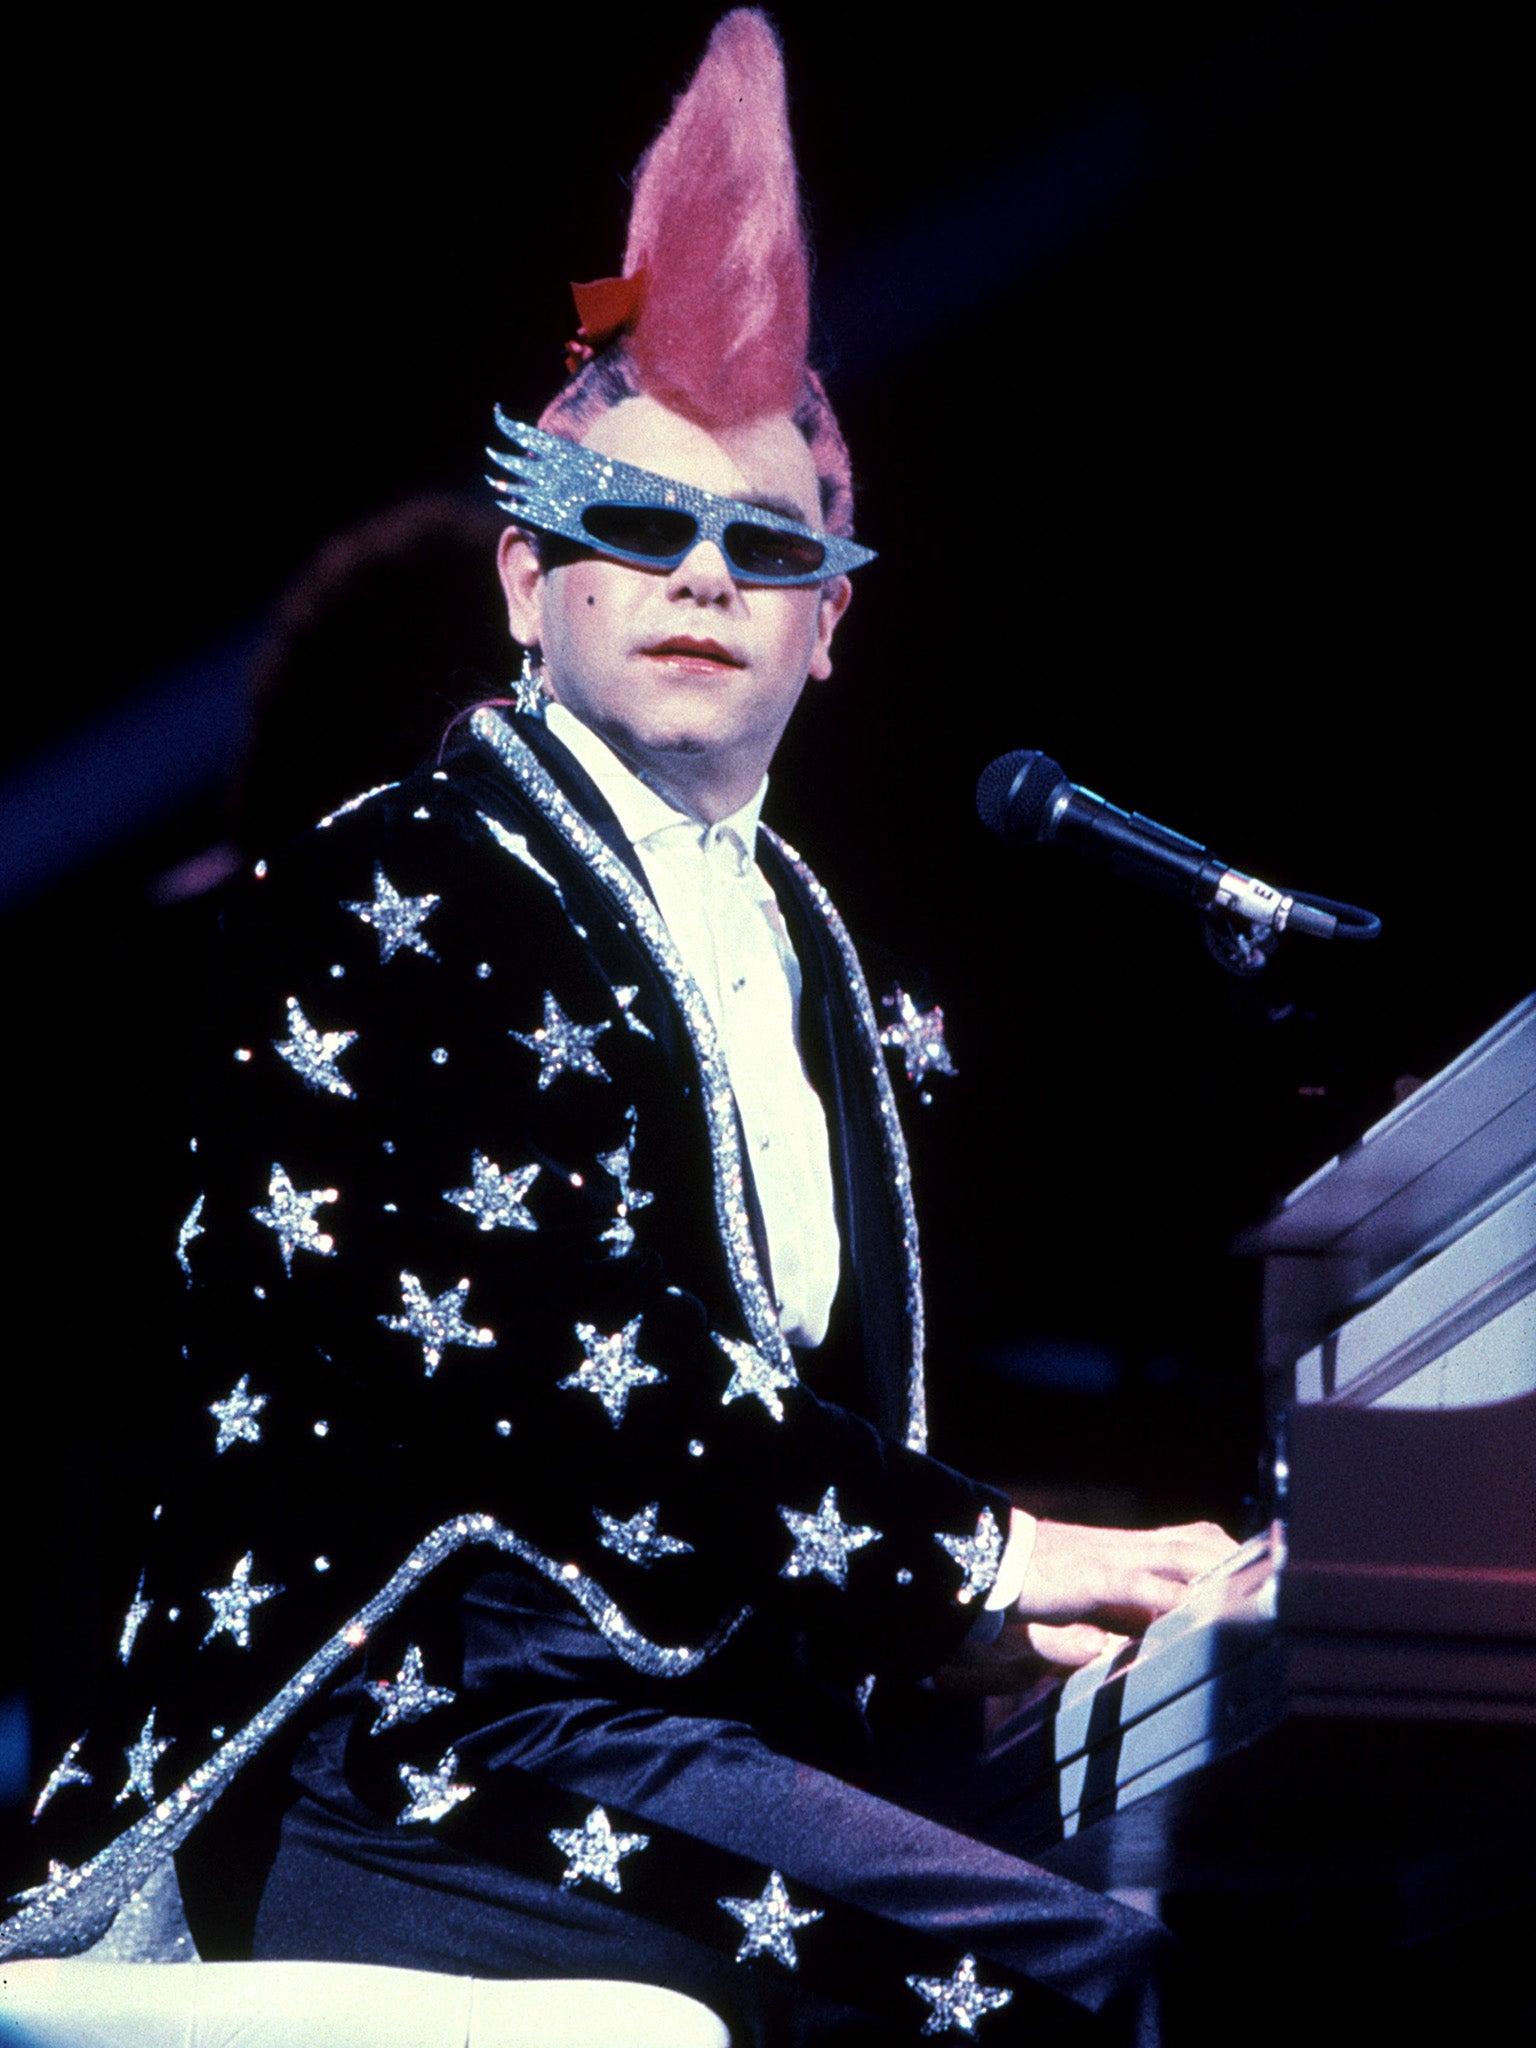 John Lewis Christmas advert: Elton John reportedly paid £5m